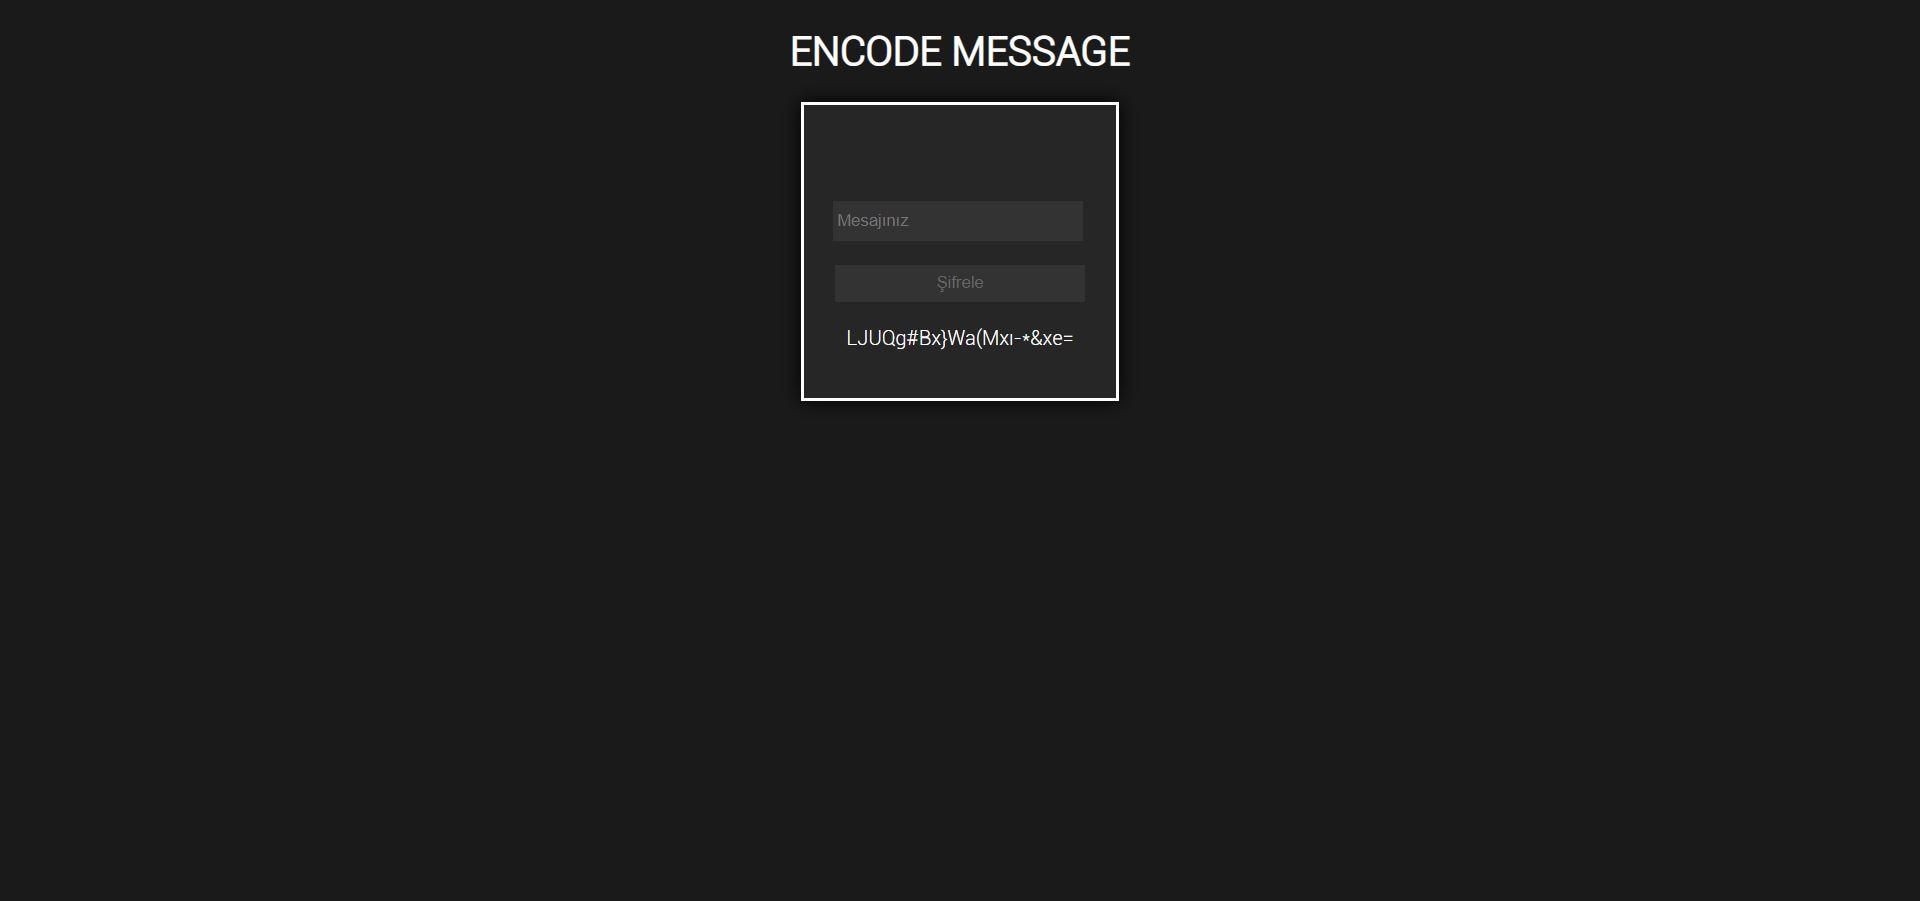 YCODEV1 - Unique message encoding program 2019